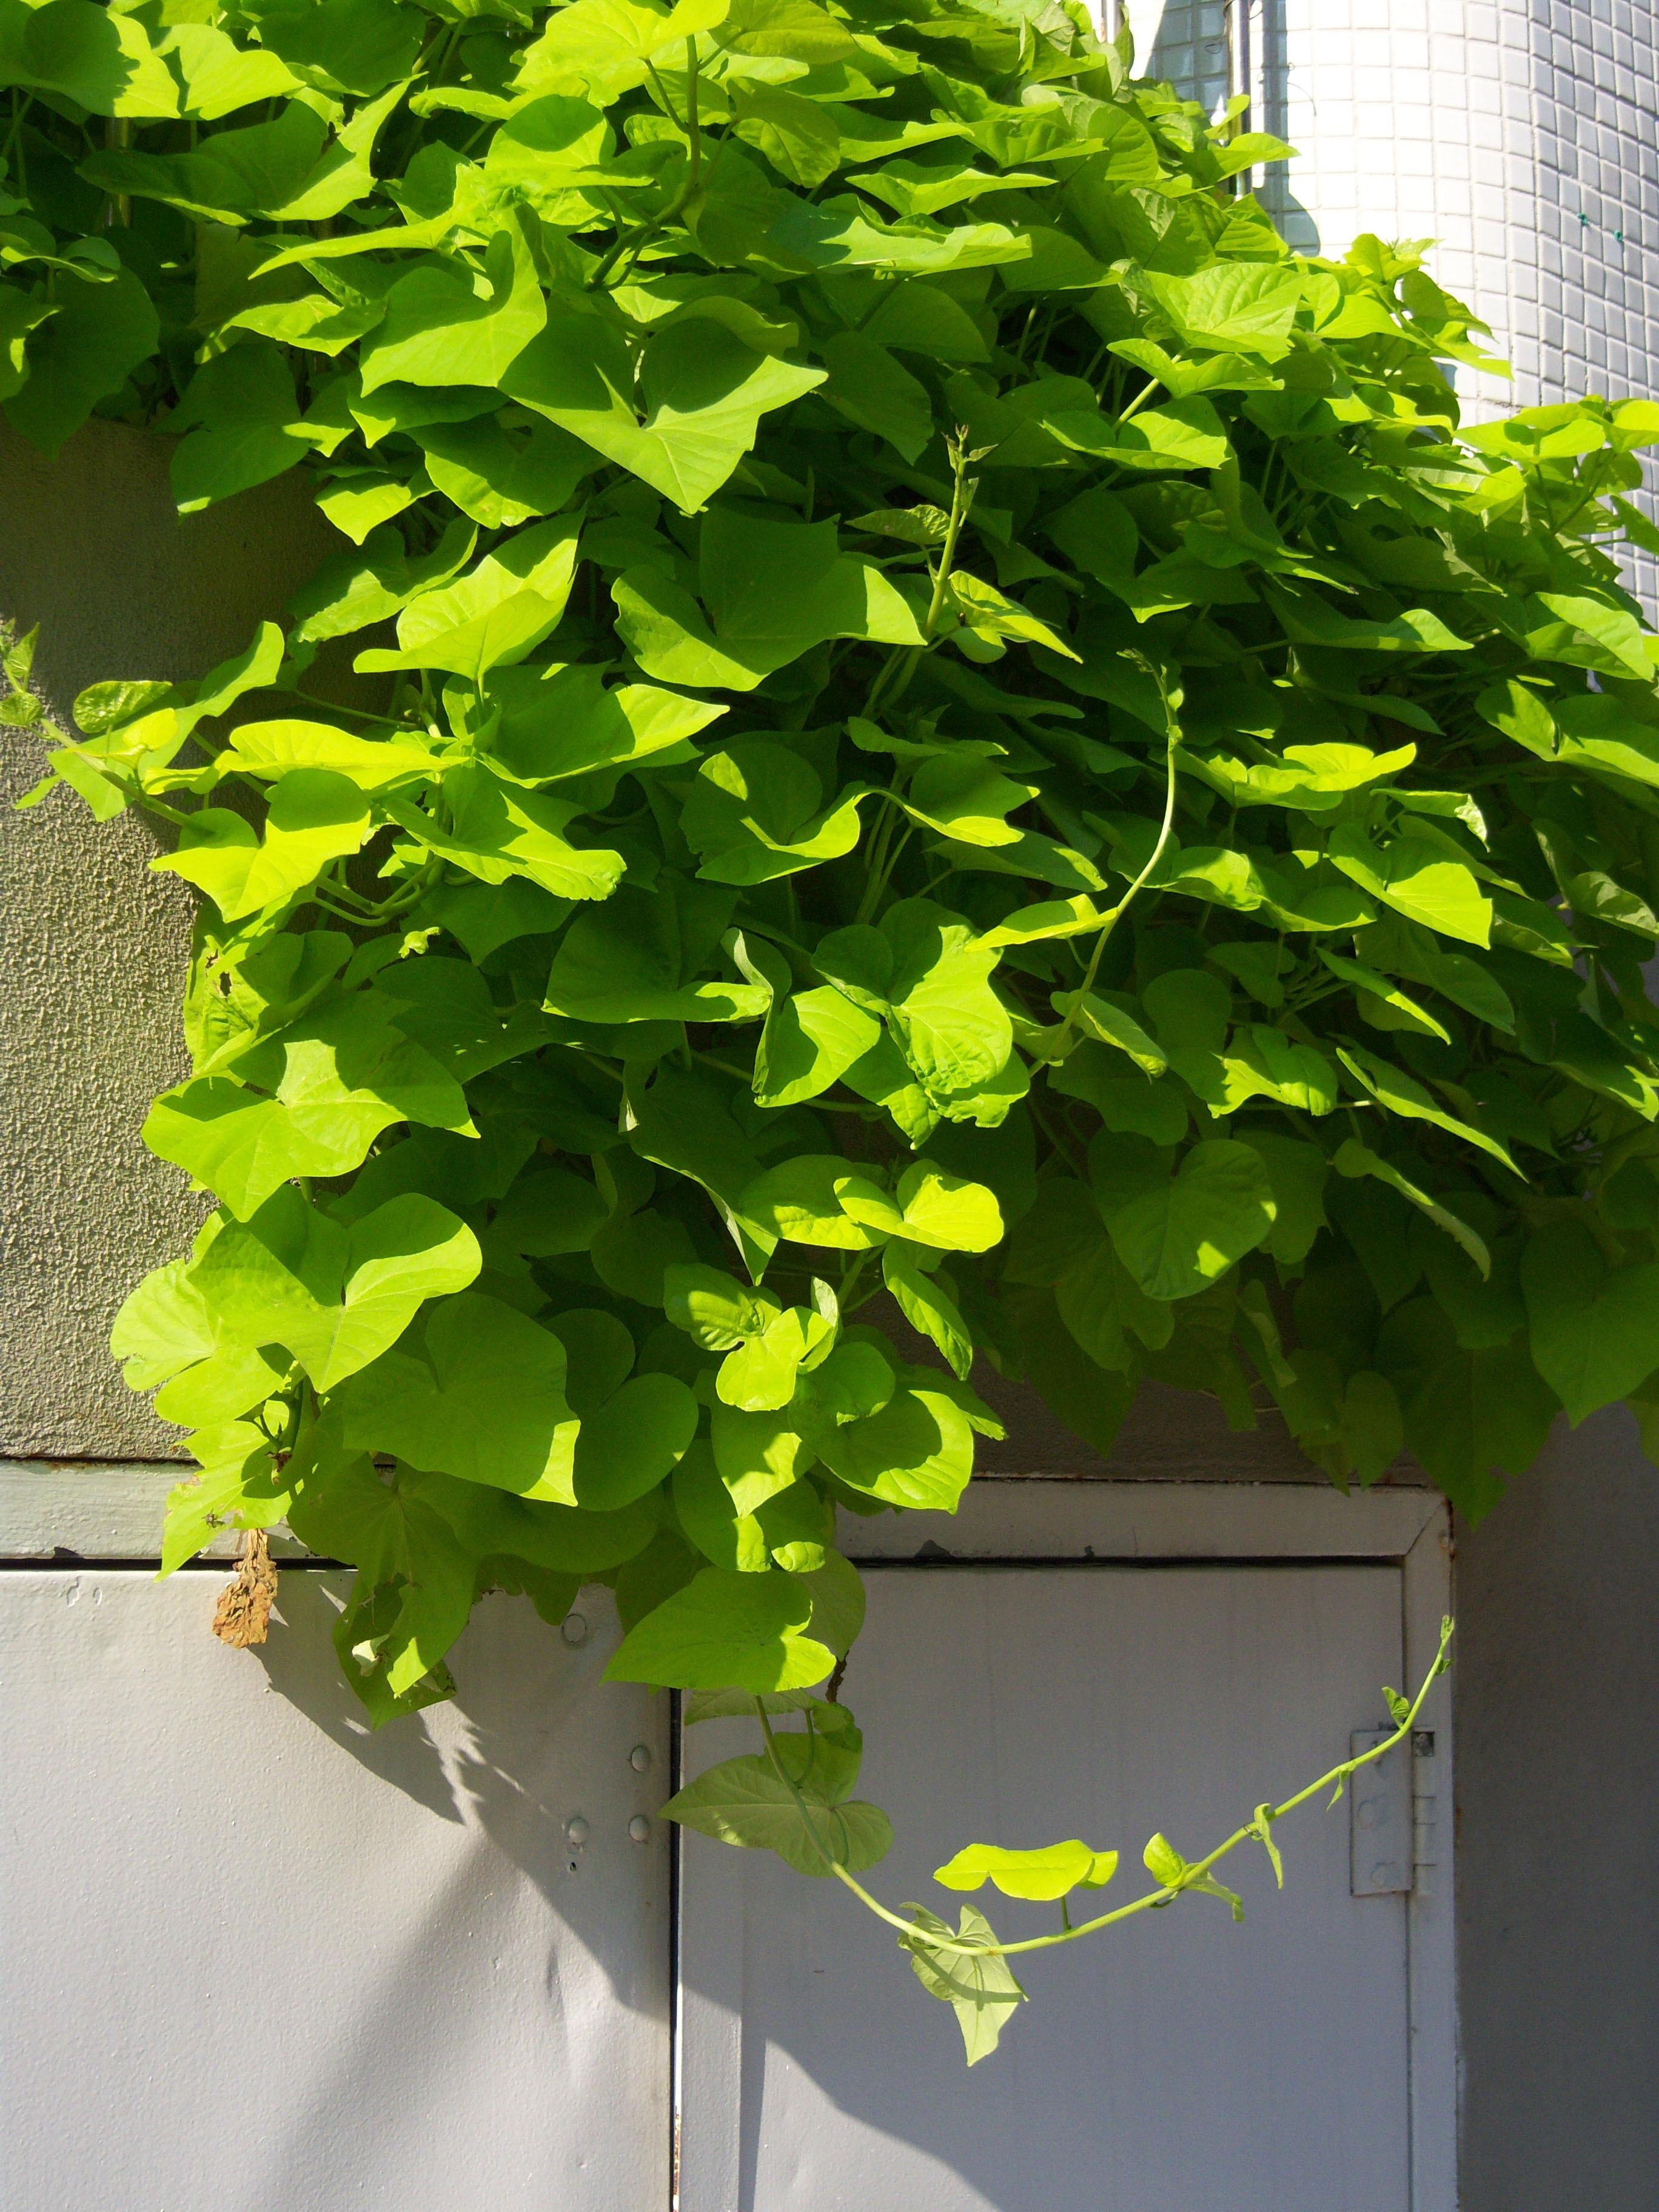 Sweet Potato Vine  How to Grow Potato Vine Plant